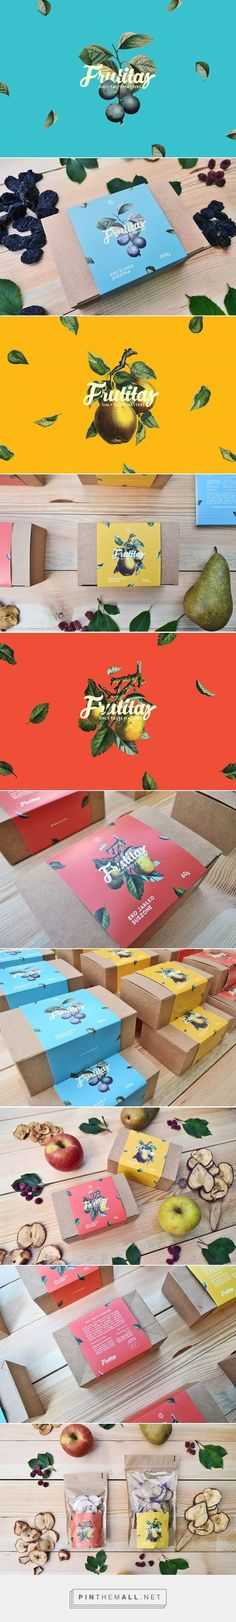 FRUTITAS processed fruit by PARIS+HENDZEL STUDIO. Pin curated by #SFields99…